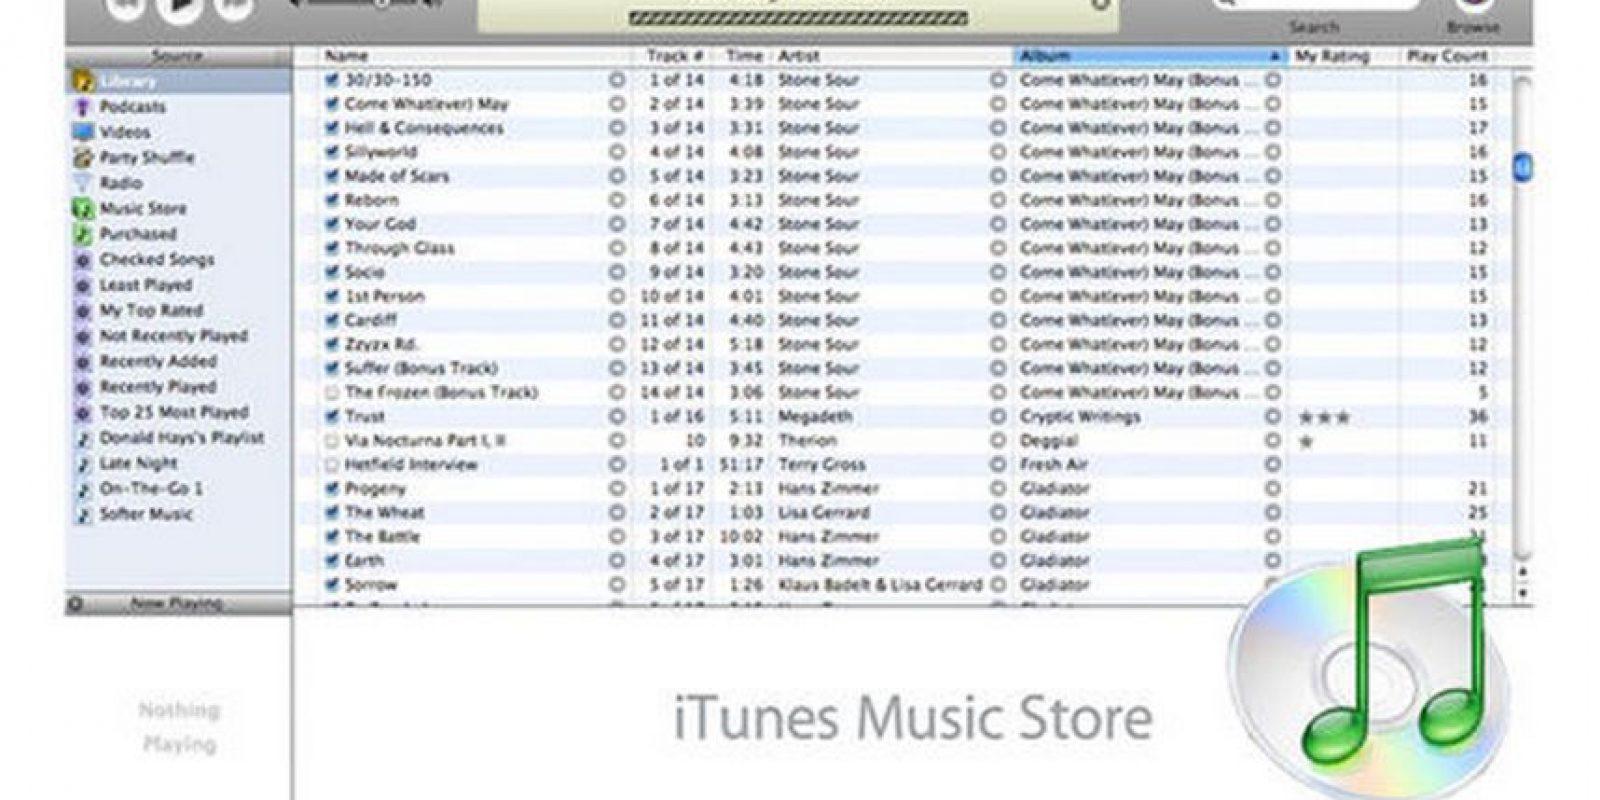 iTunes 6.0 Foto:Apple